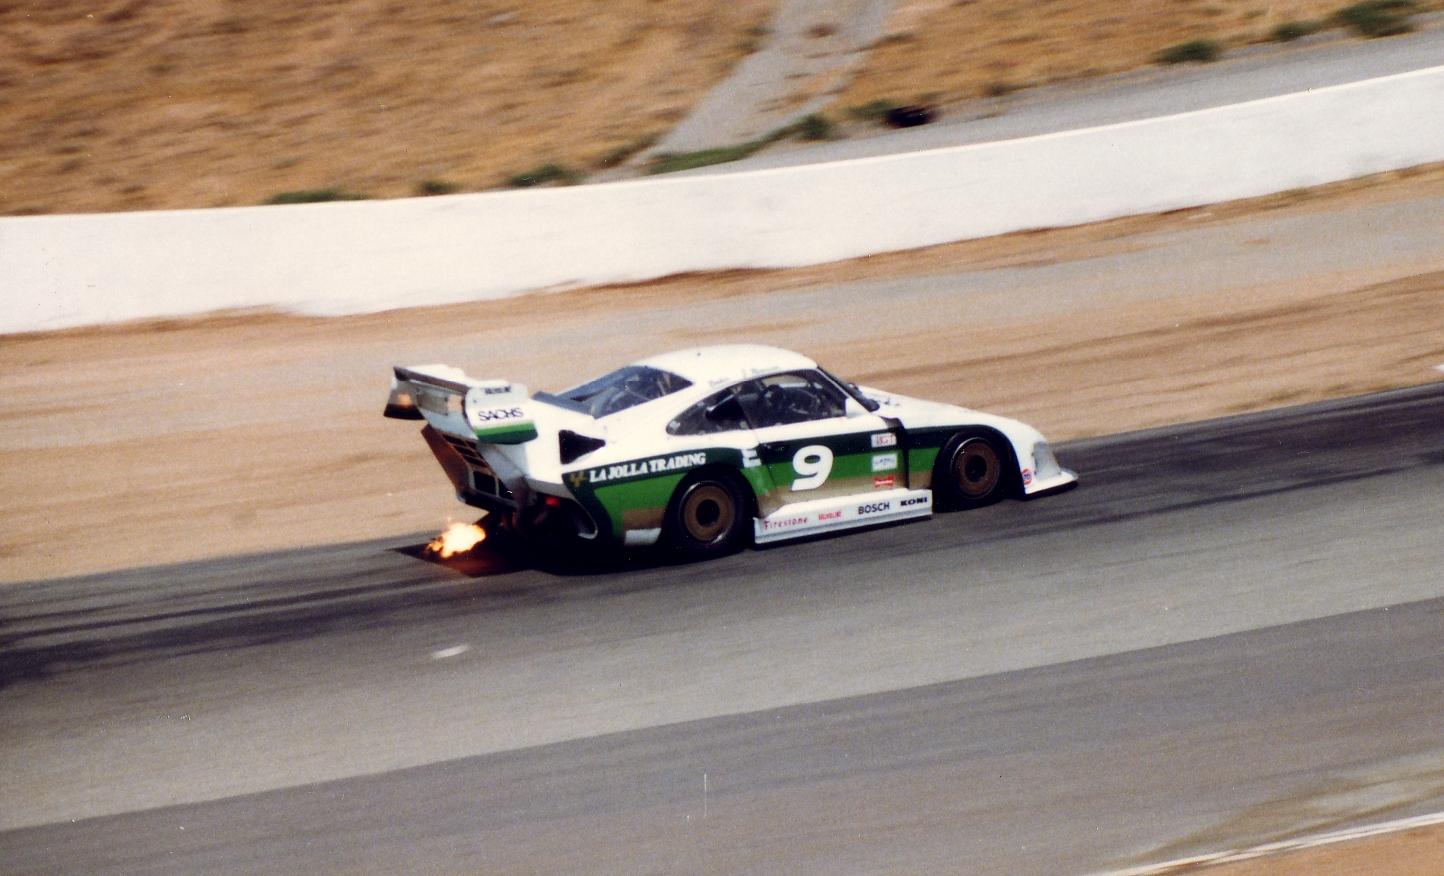 Porsche 935 entering Turn 6 at Riverside, '84 Times GP